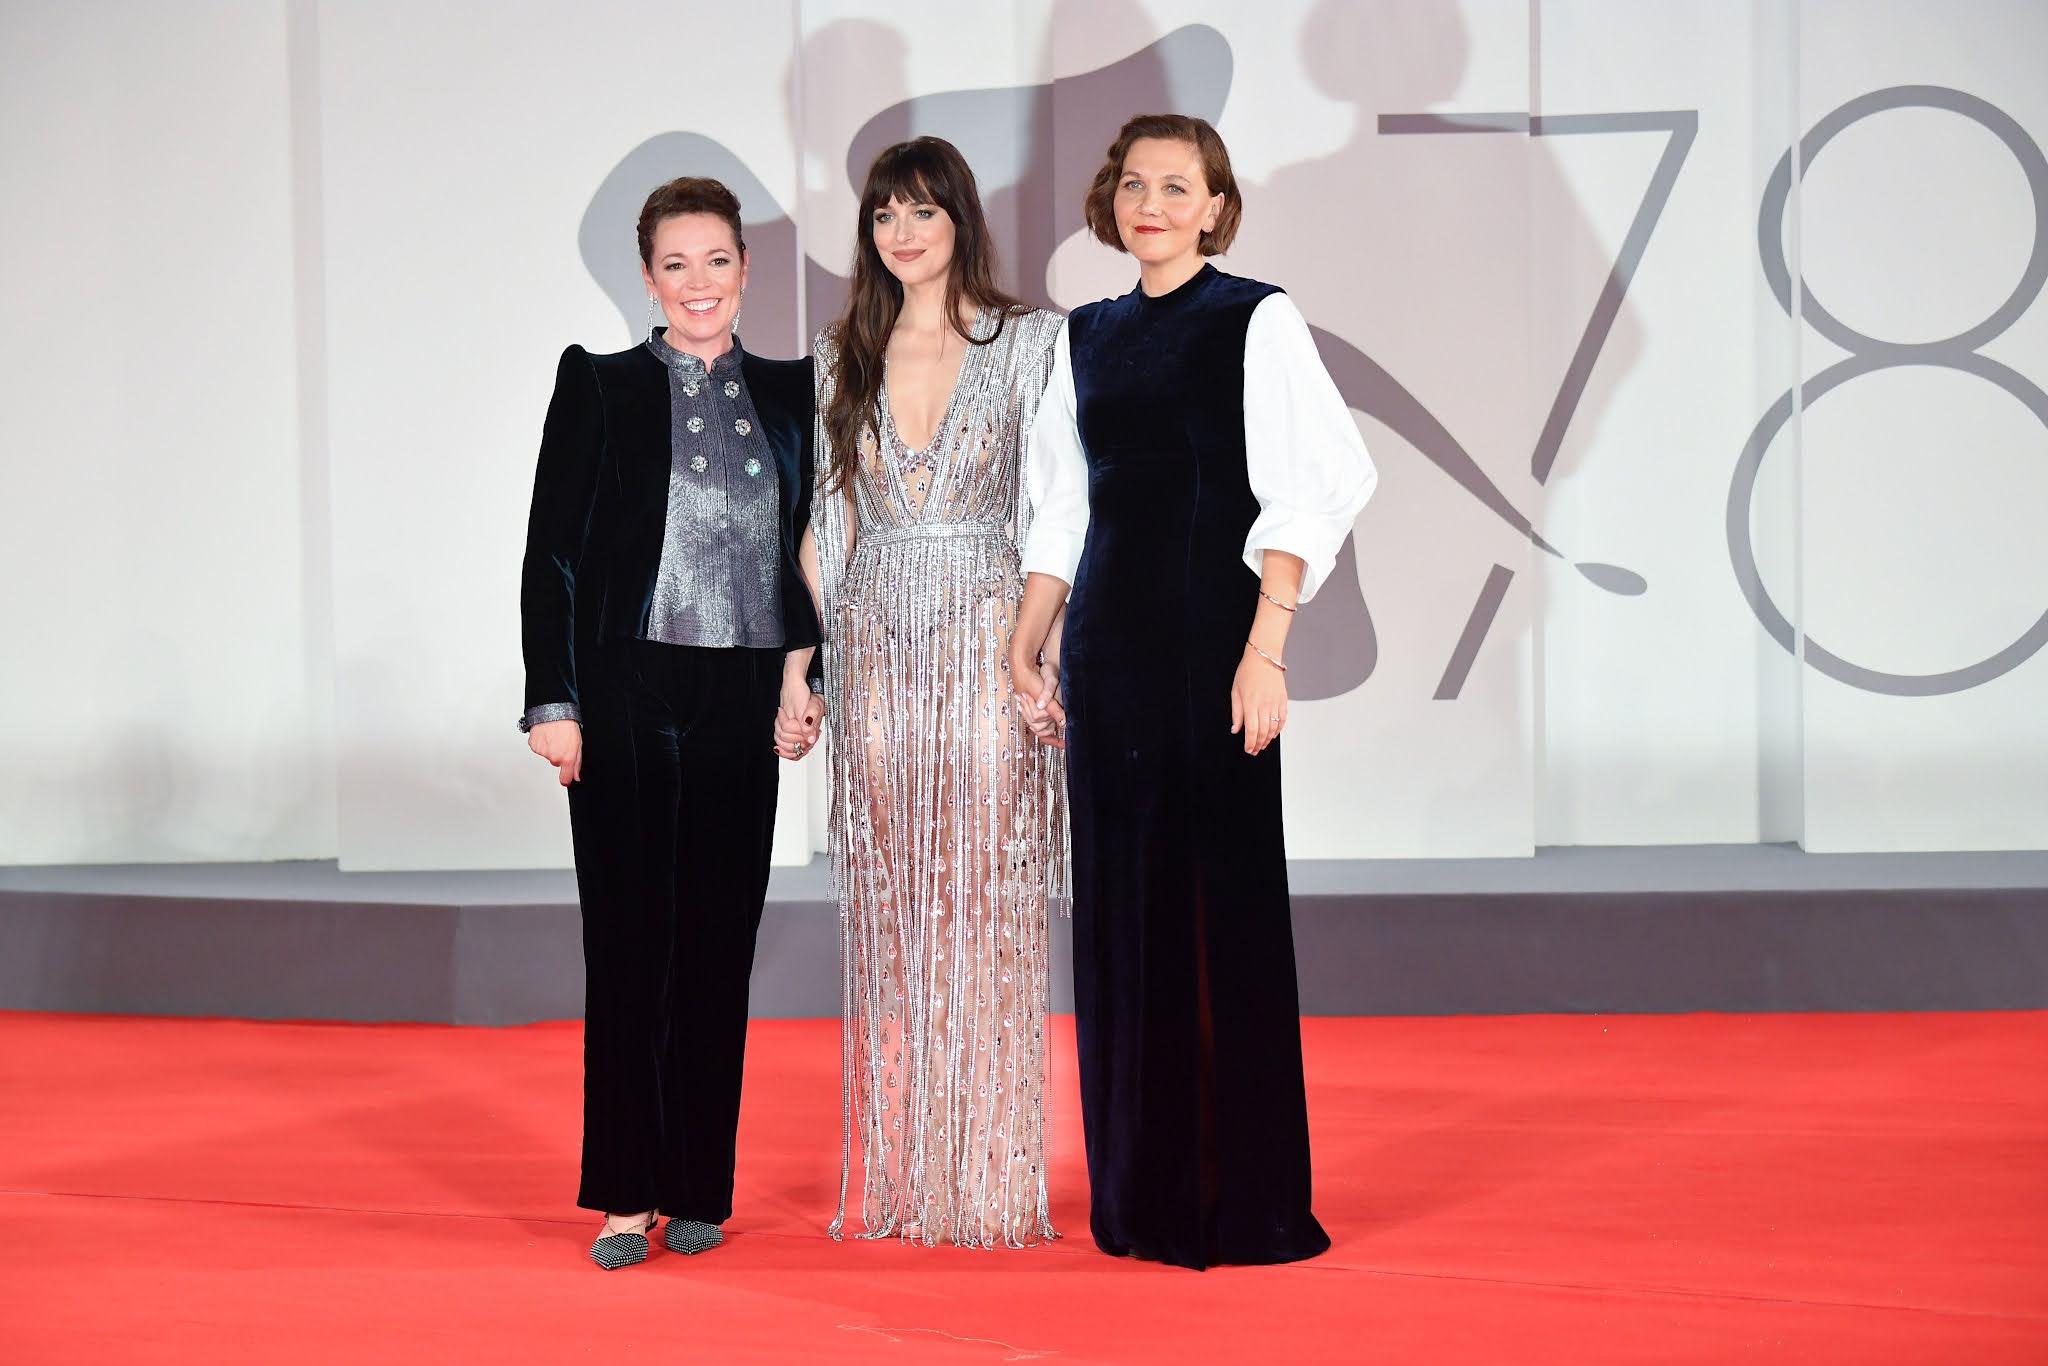 Maggie Gyllenhaal, Olivia Colman and Dakota Johnson on the Venice Film Festival red carpet for THE LOST DAUGHTER premiere